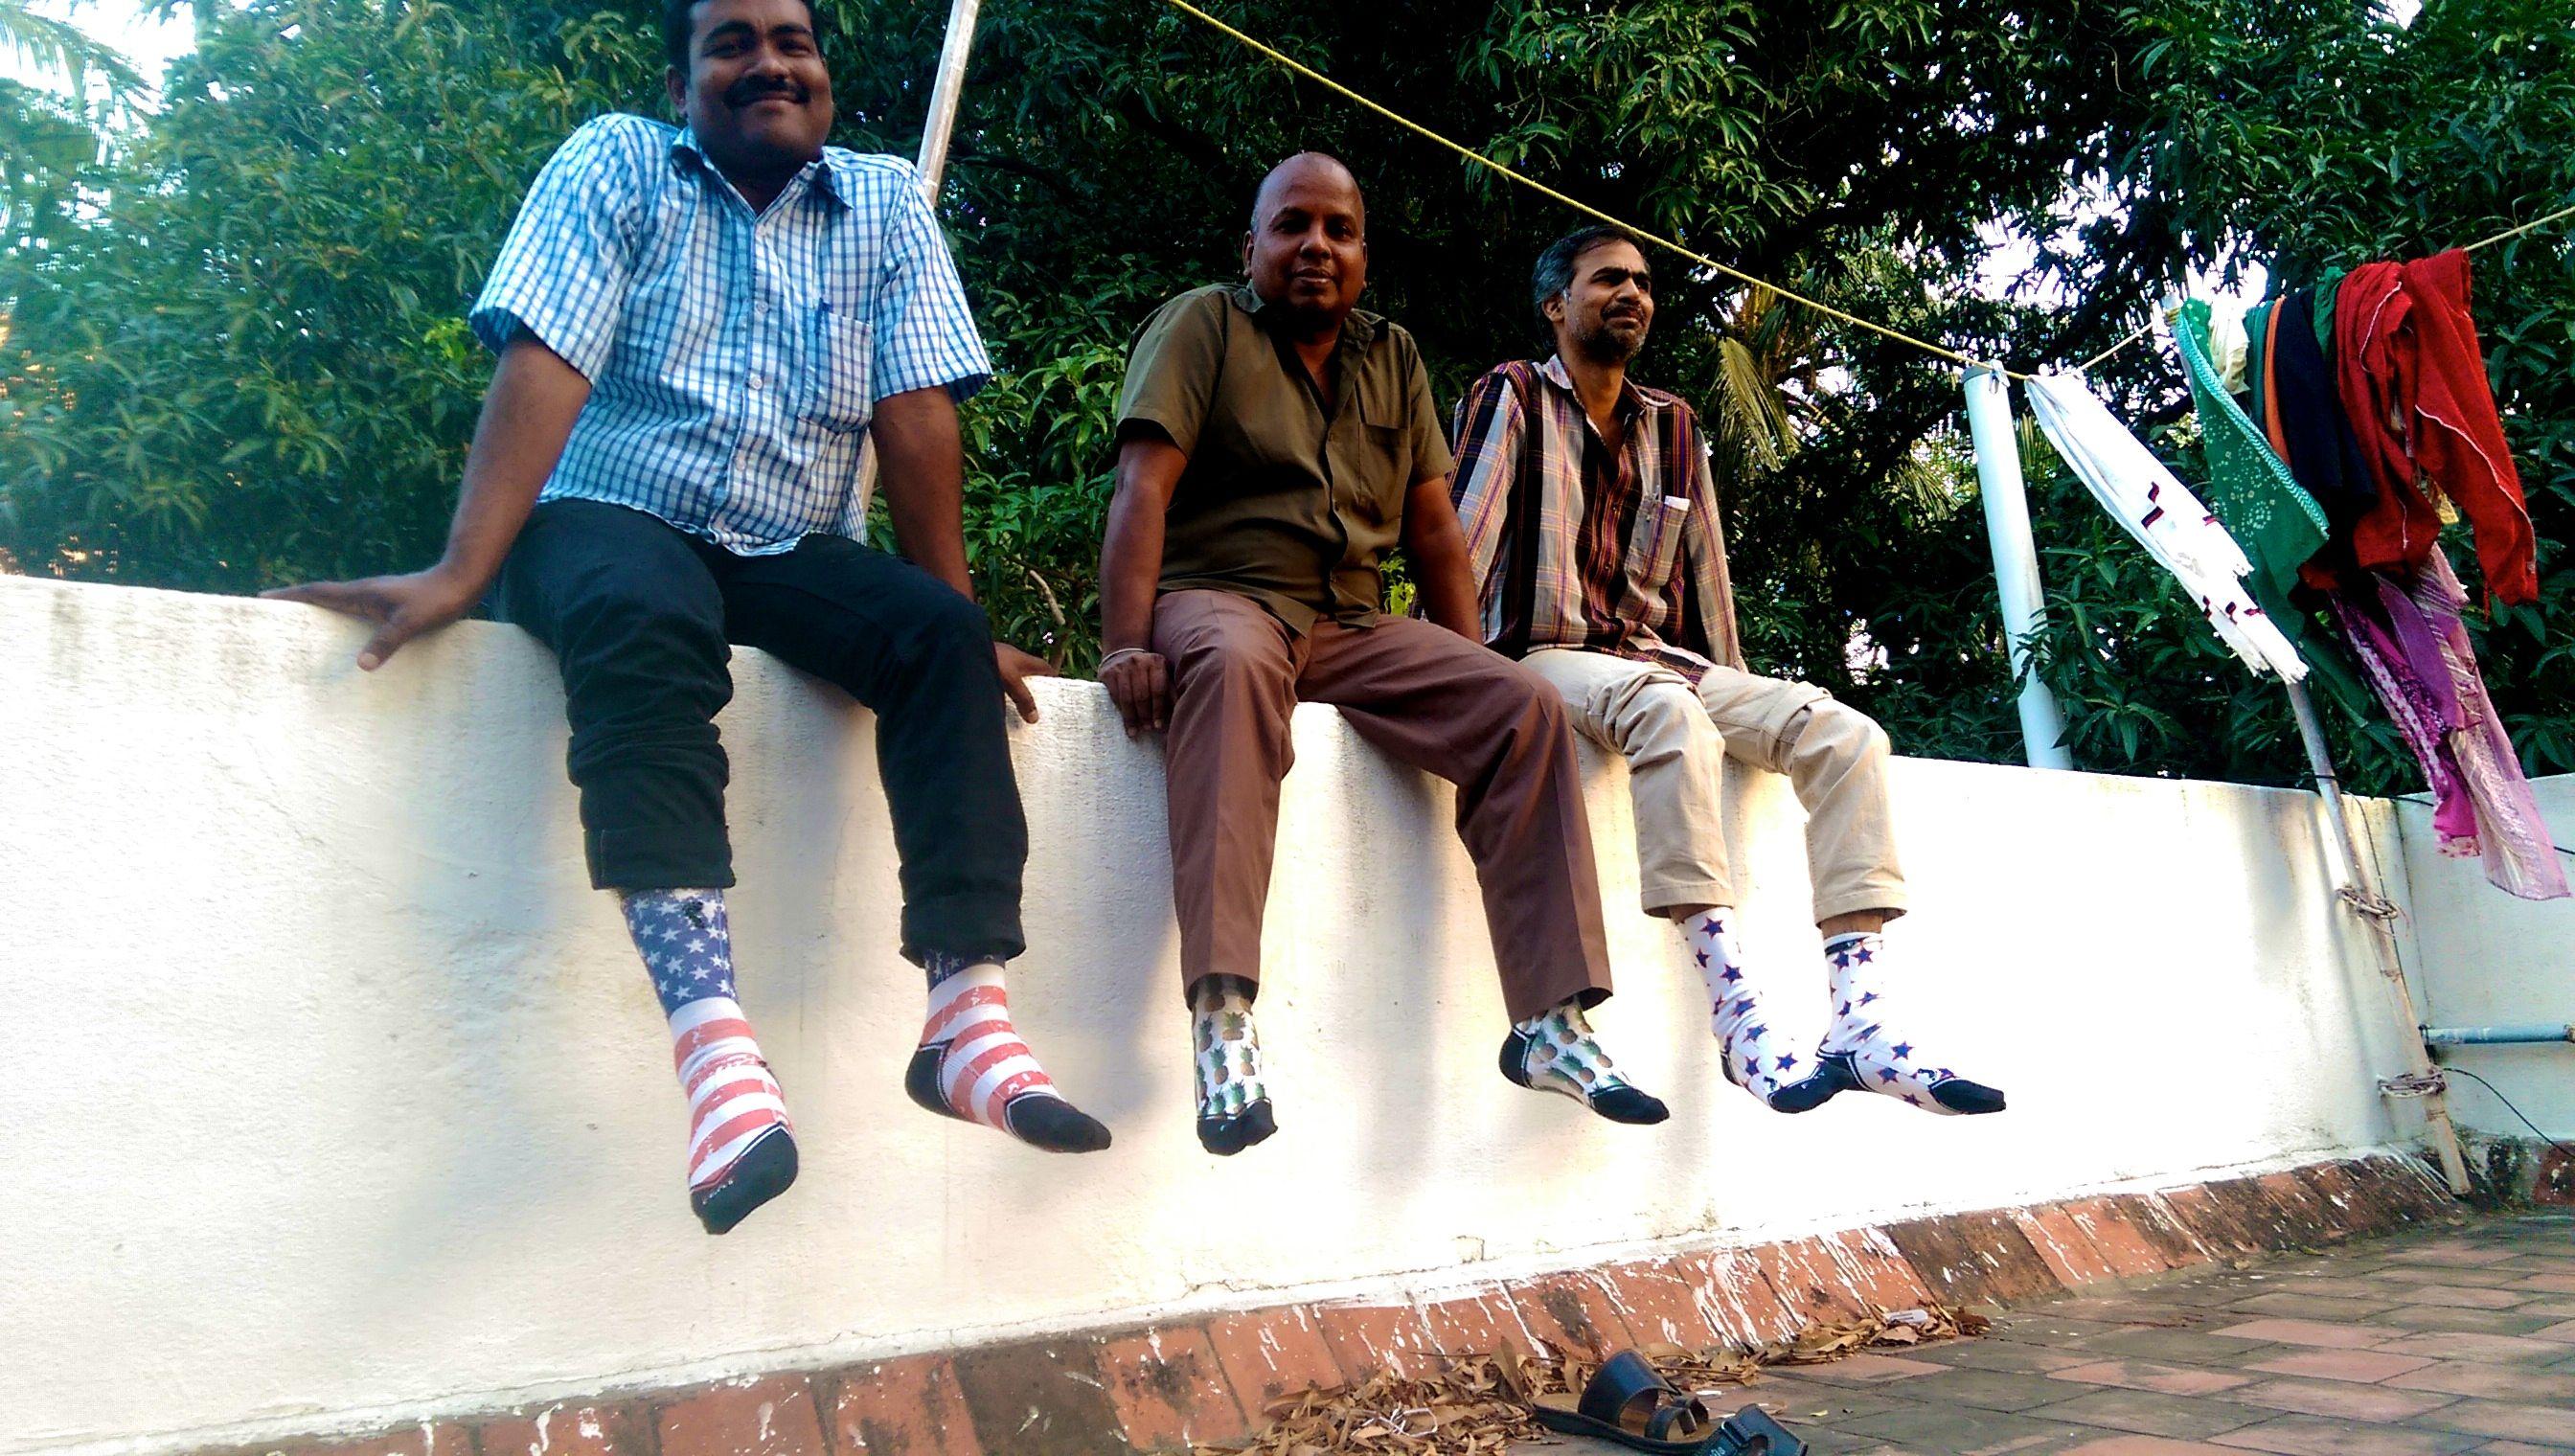 FEAT Socks spreading joy to families in Chennai, India.